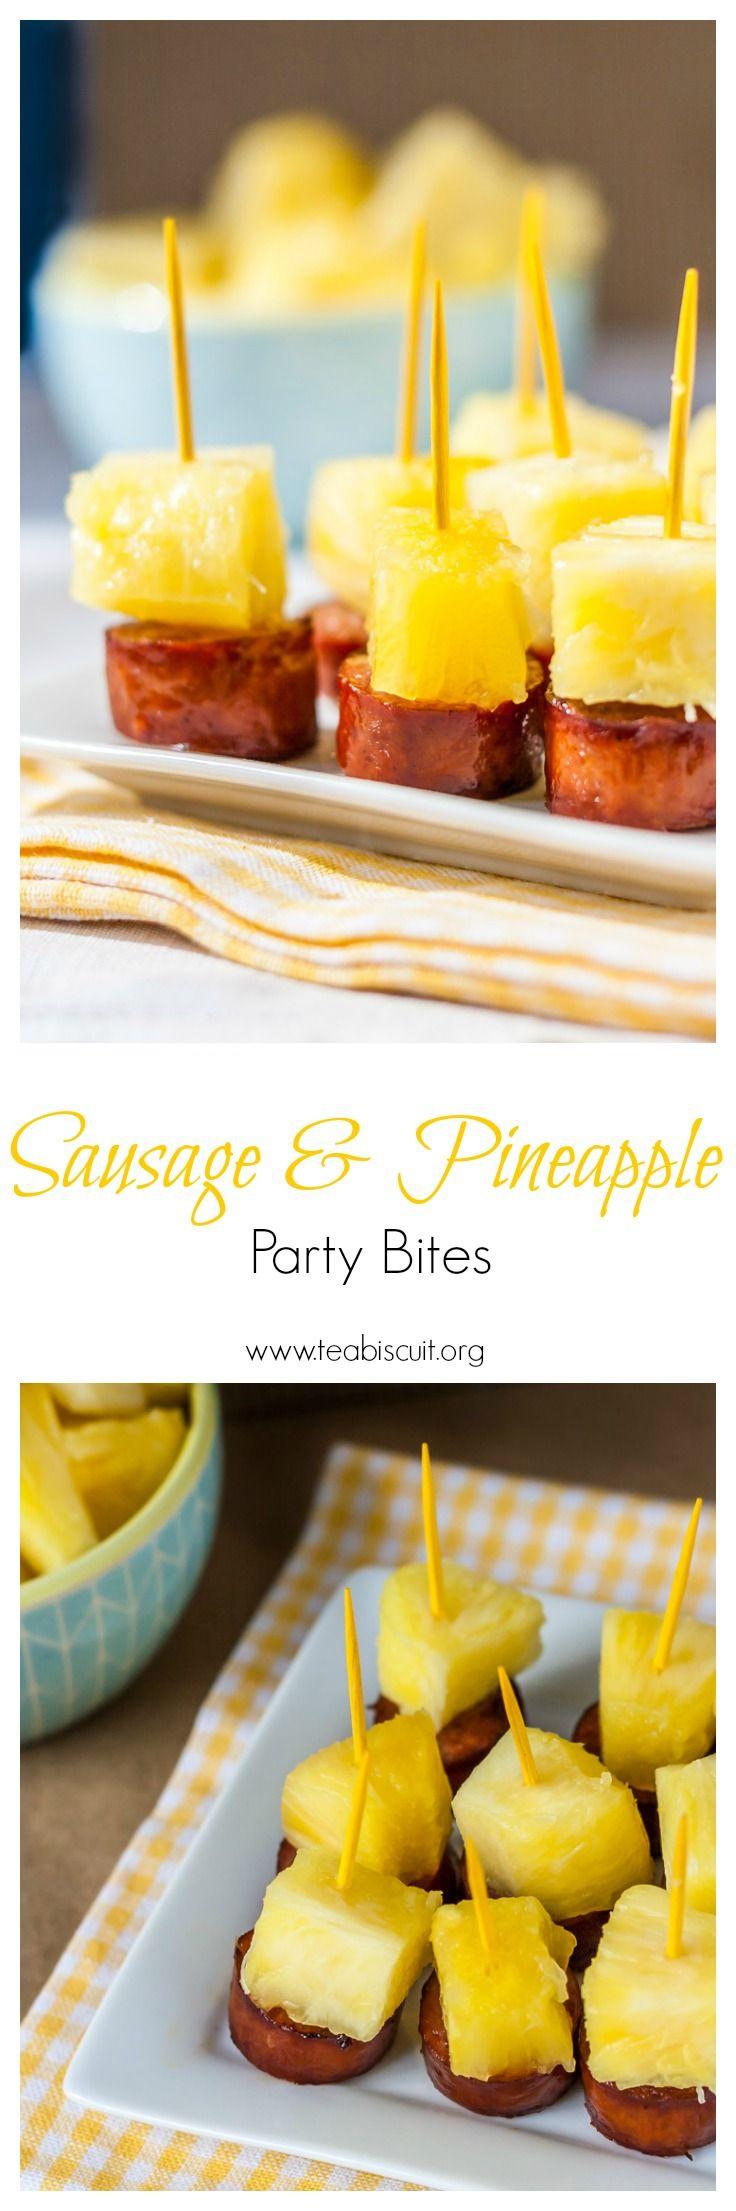 Sausage and Pineapple Party Bites   Recipe   Sausage